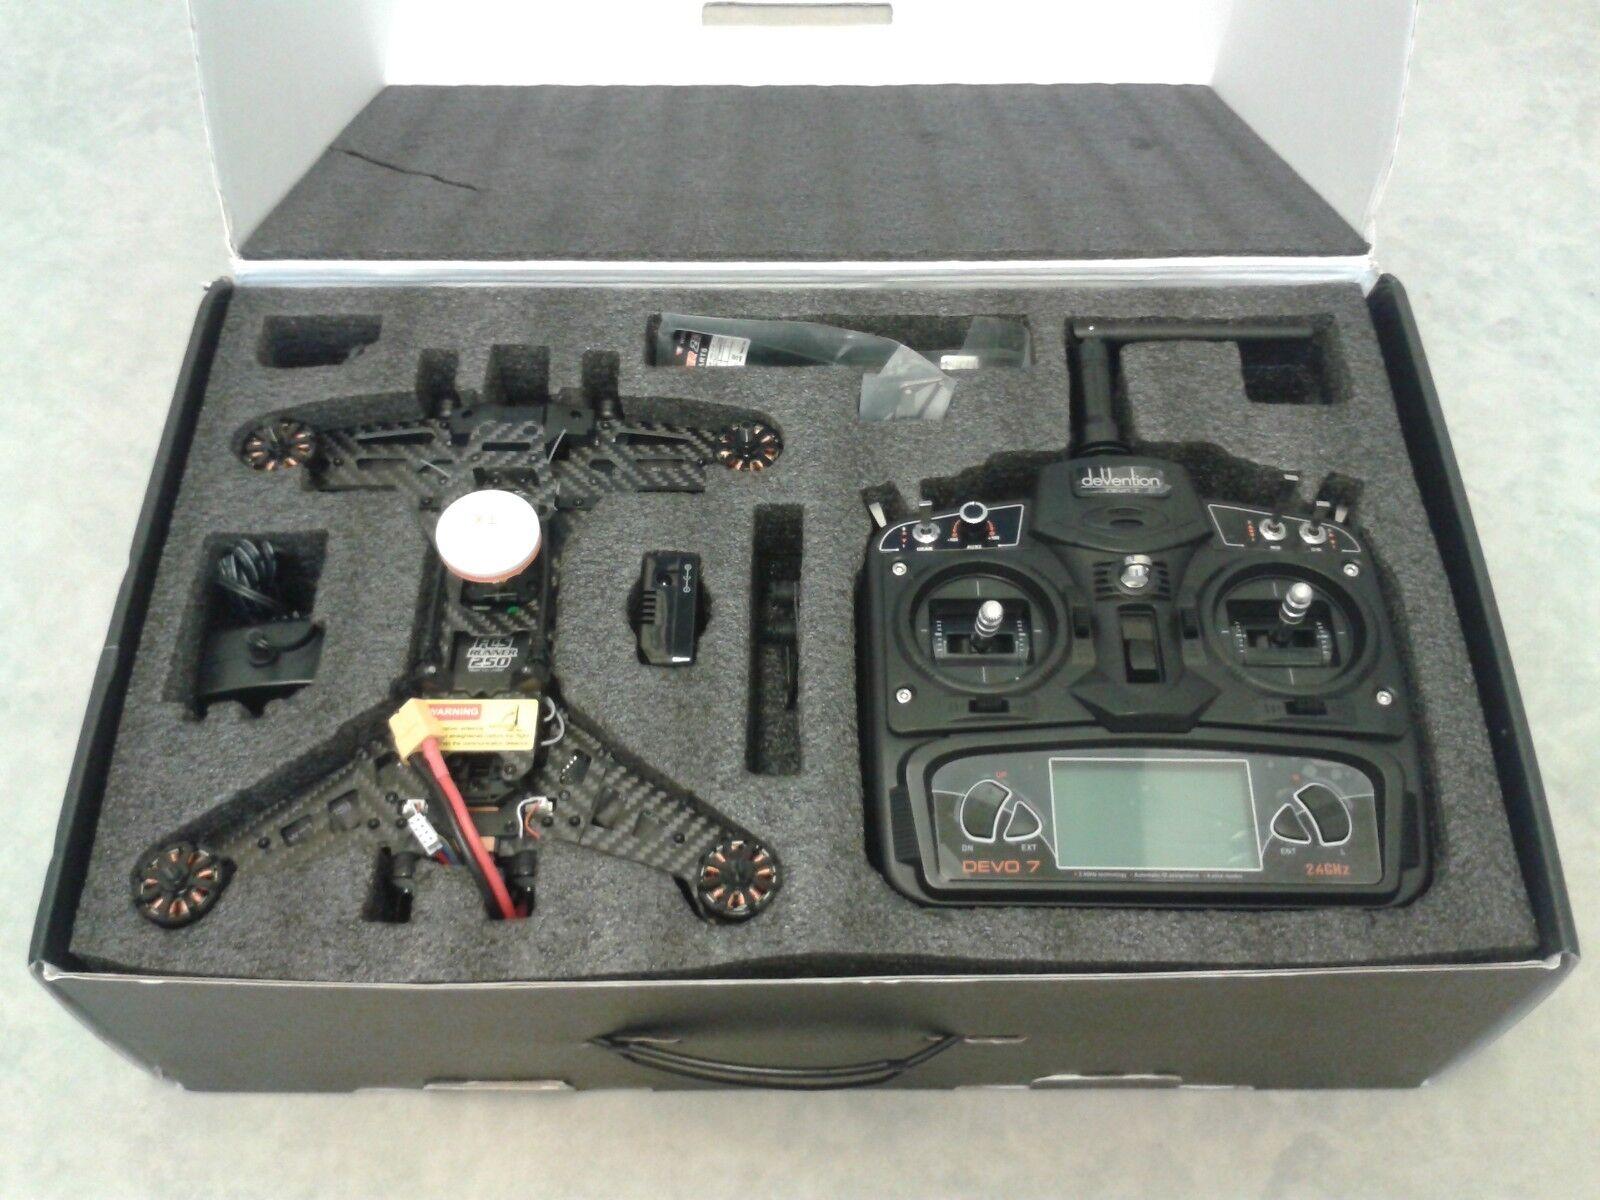 WALKERA Runner 250 RC Quadcopter Racing Drone FPV Camera 5.8GHz DEVO 7 RTF UK